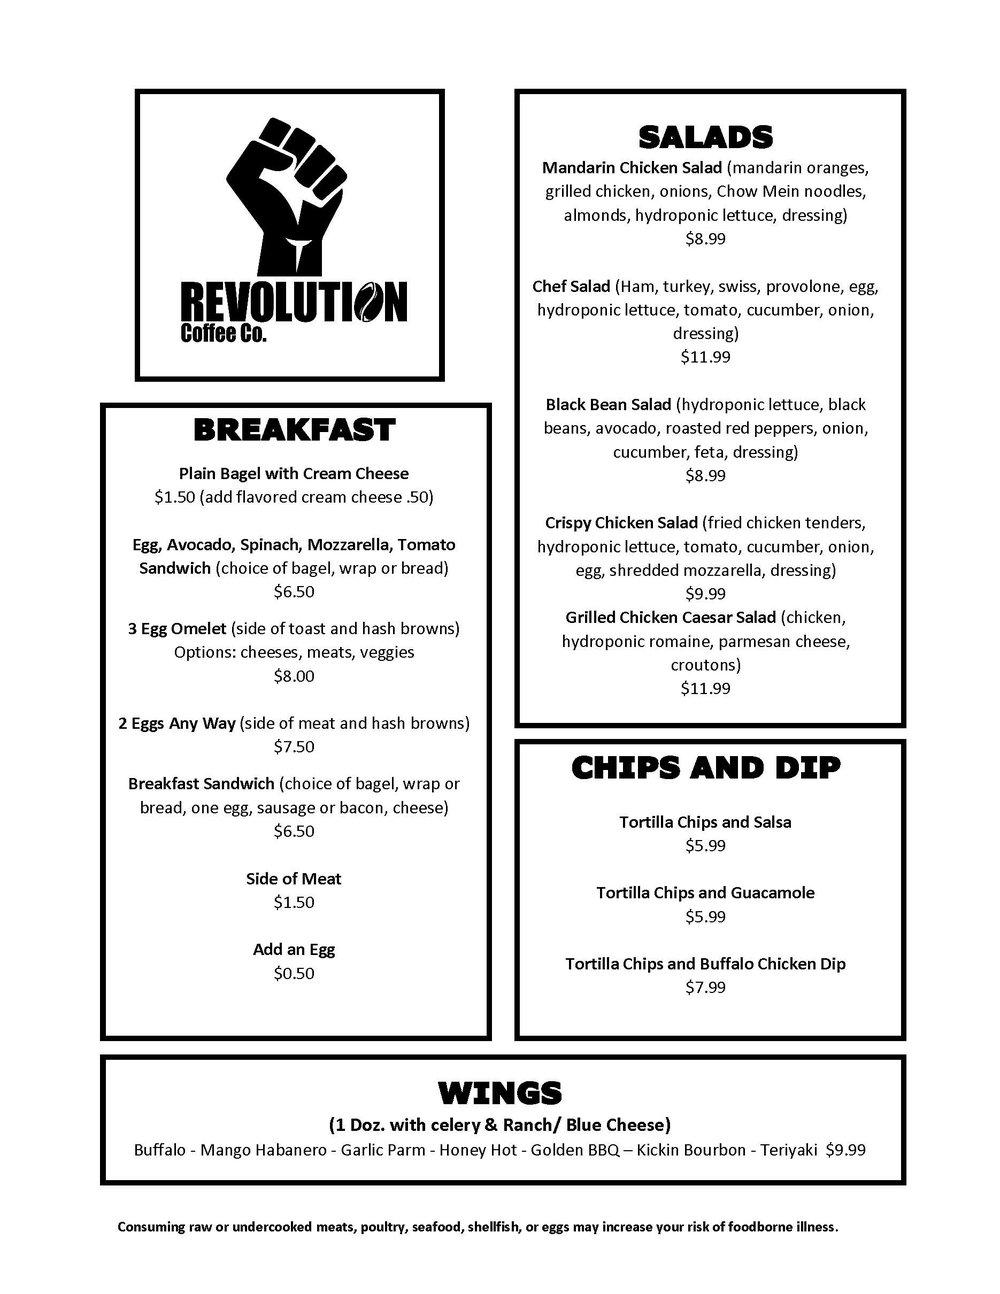 Revolution Menu_Page_1.jpg